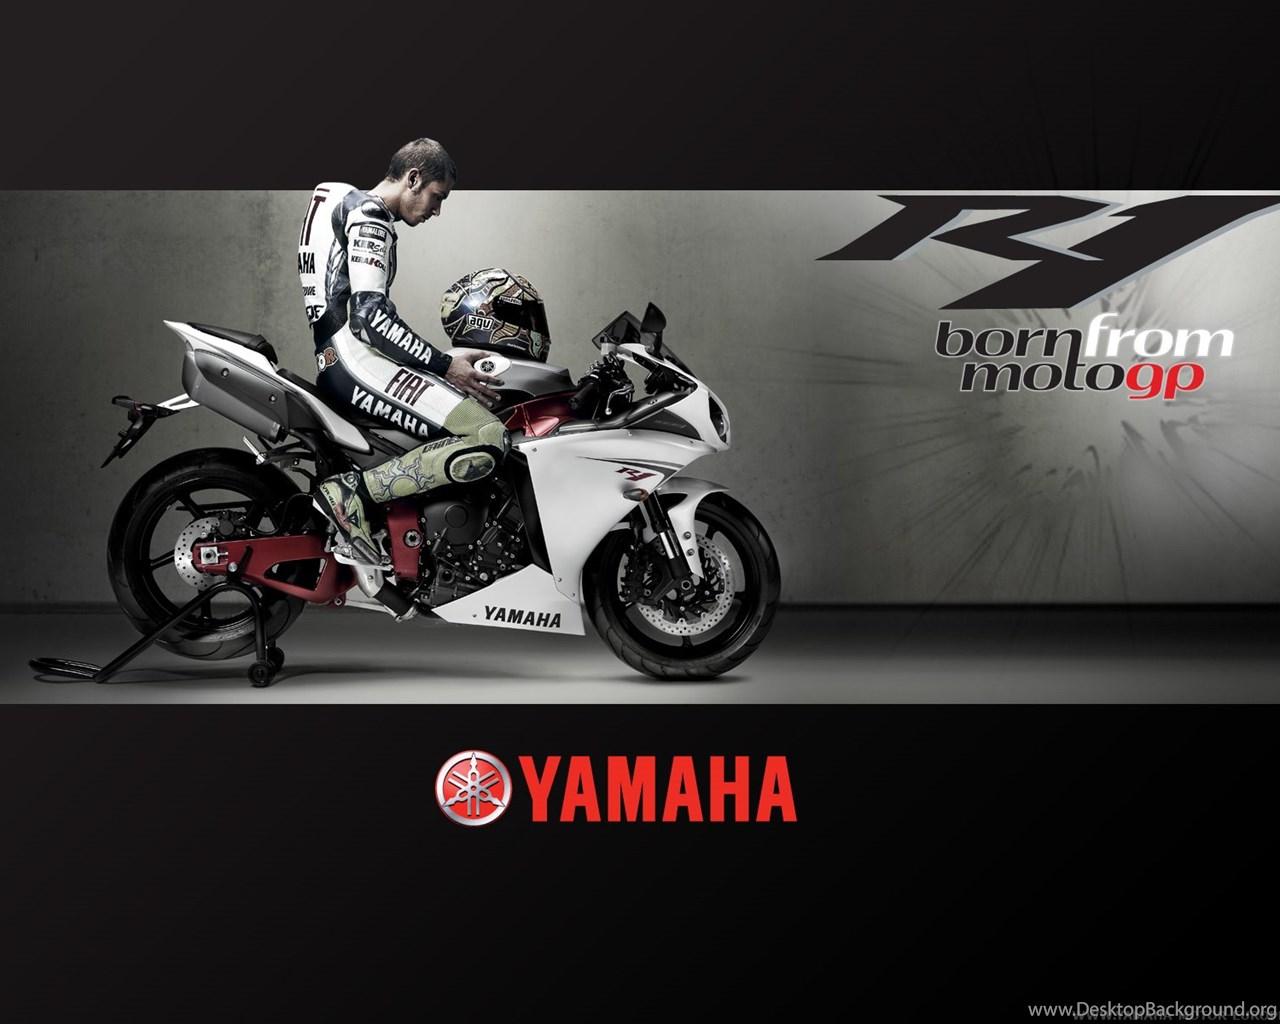 8589130574310 Yamaha R1 Wallpaper Hd Jpg Motorcycle Wallpapers Desktop Background